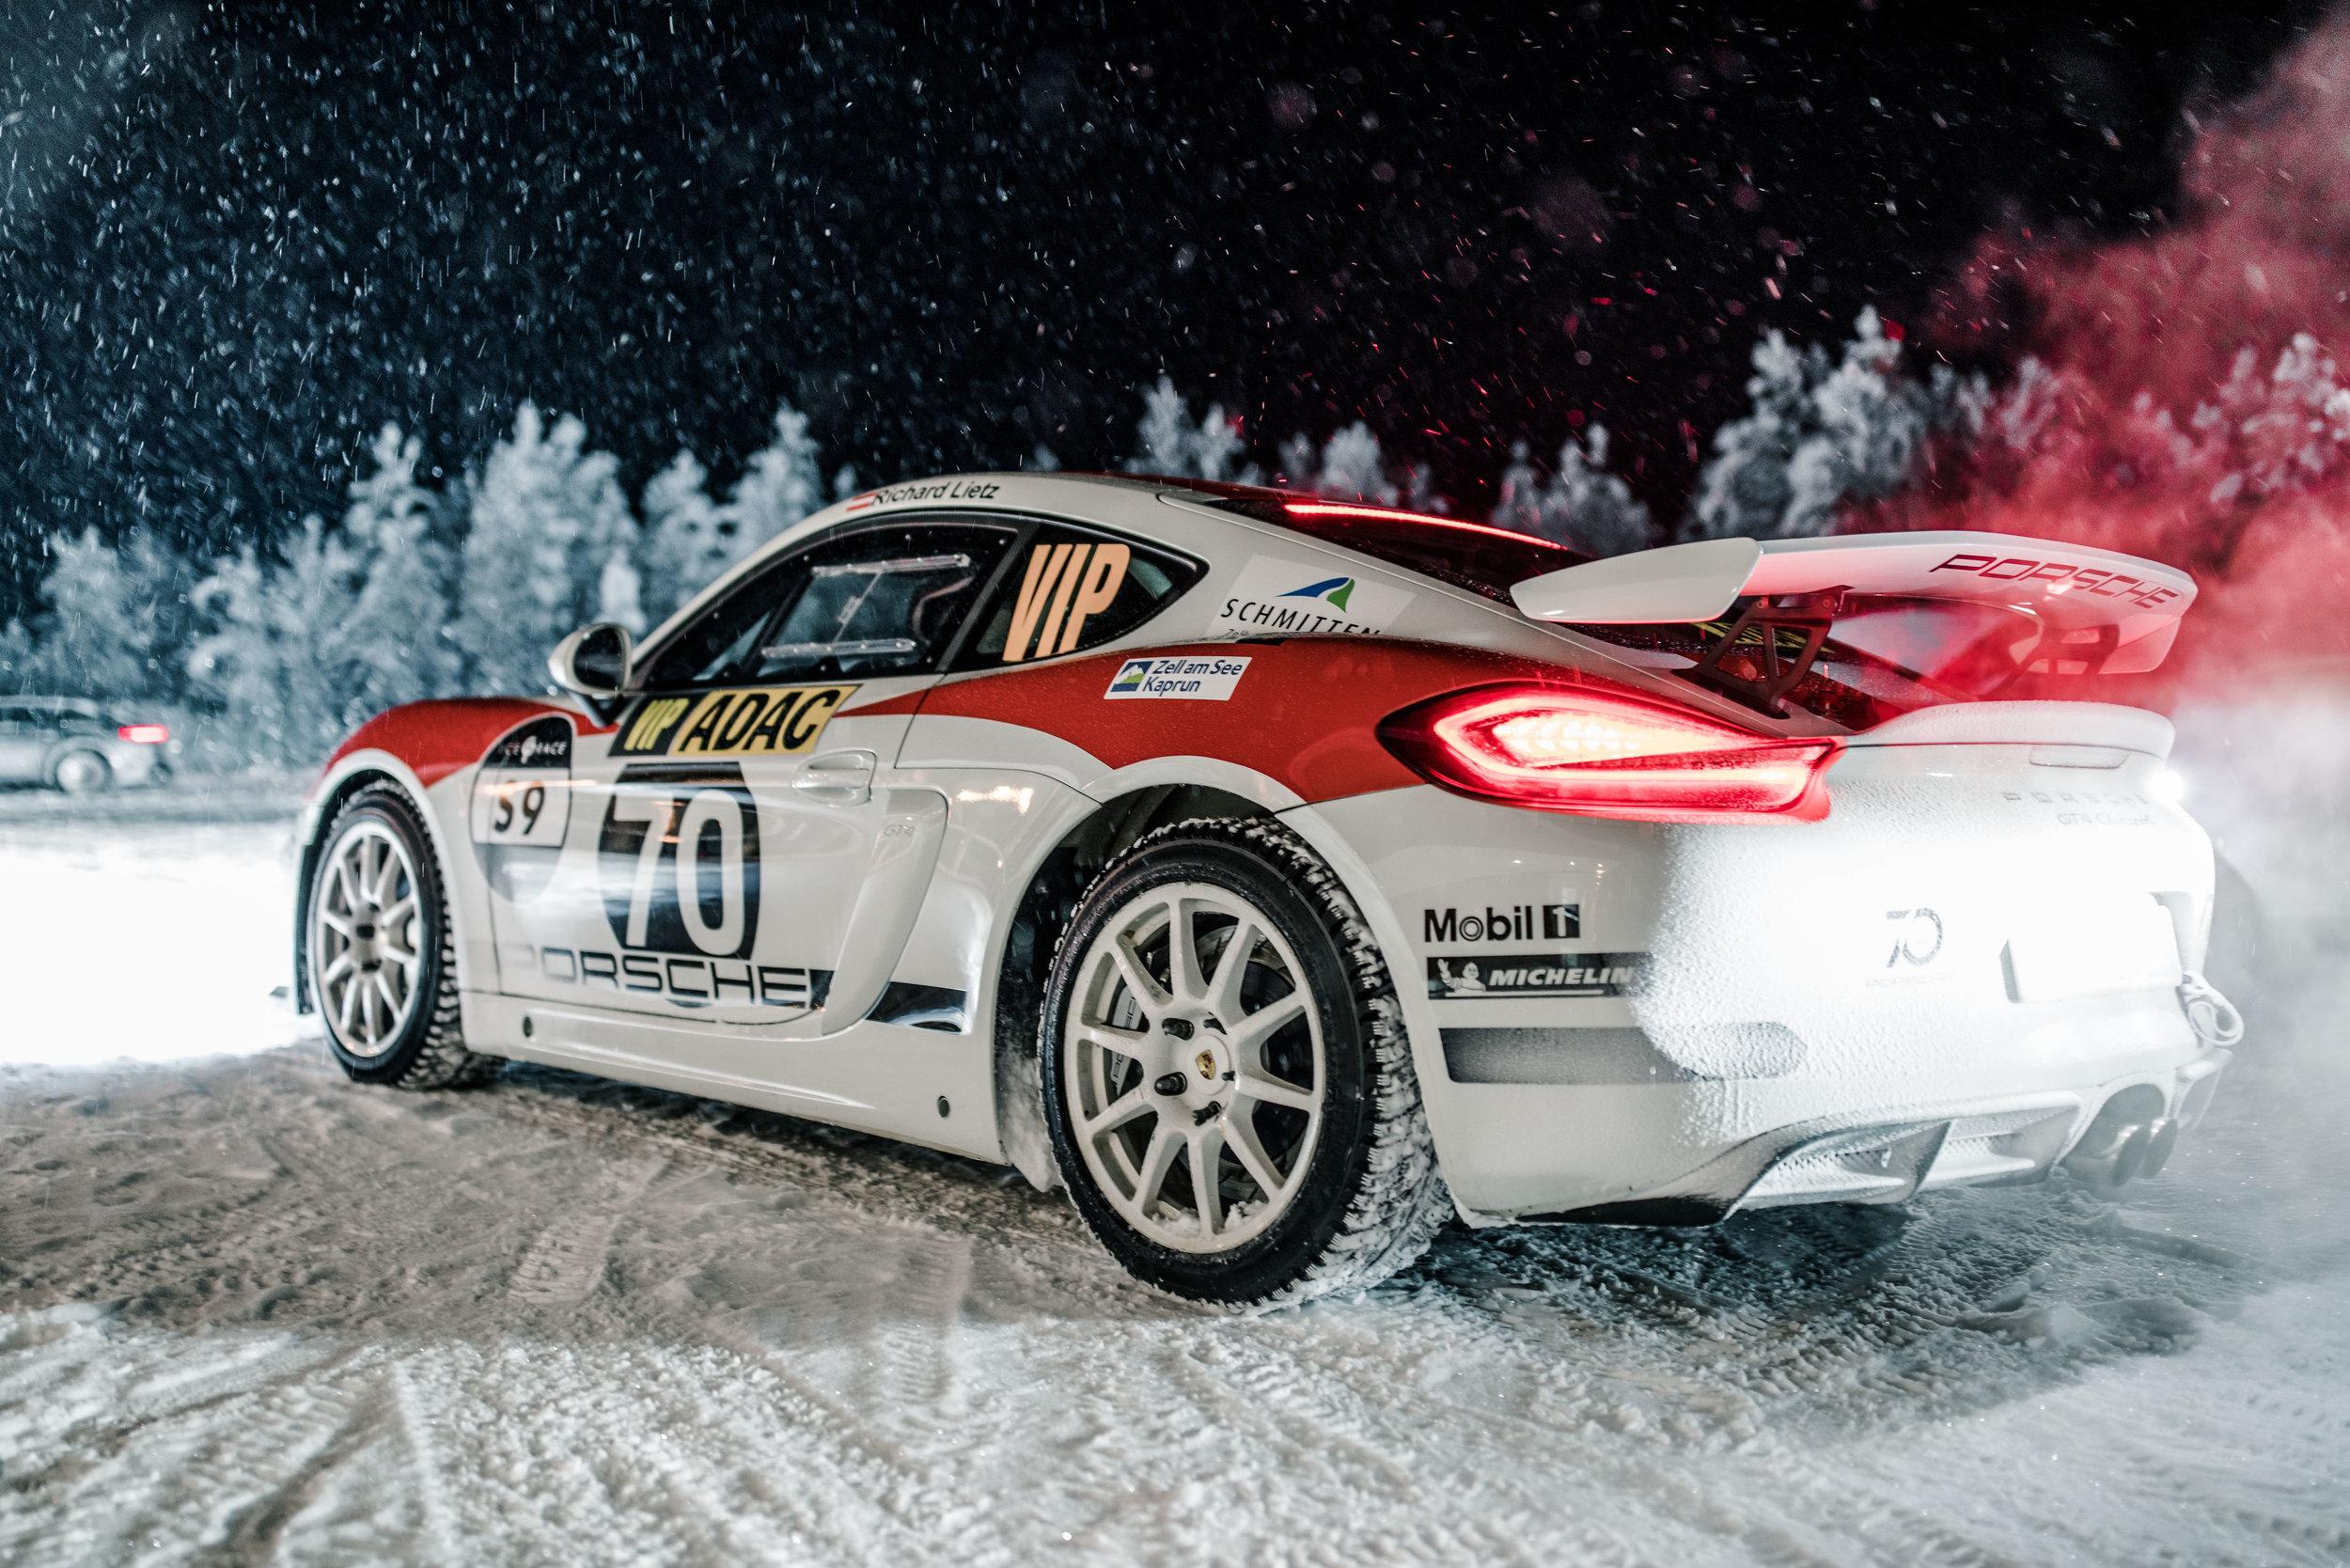 Porsche Ice Experience on Ice_30_01_2019_0570_175699.jpg